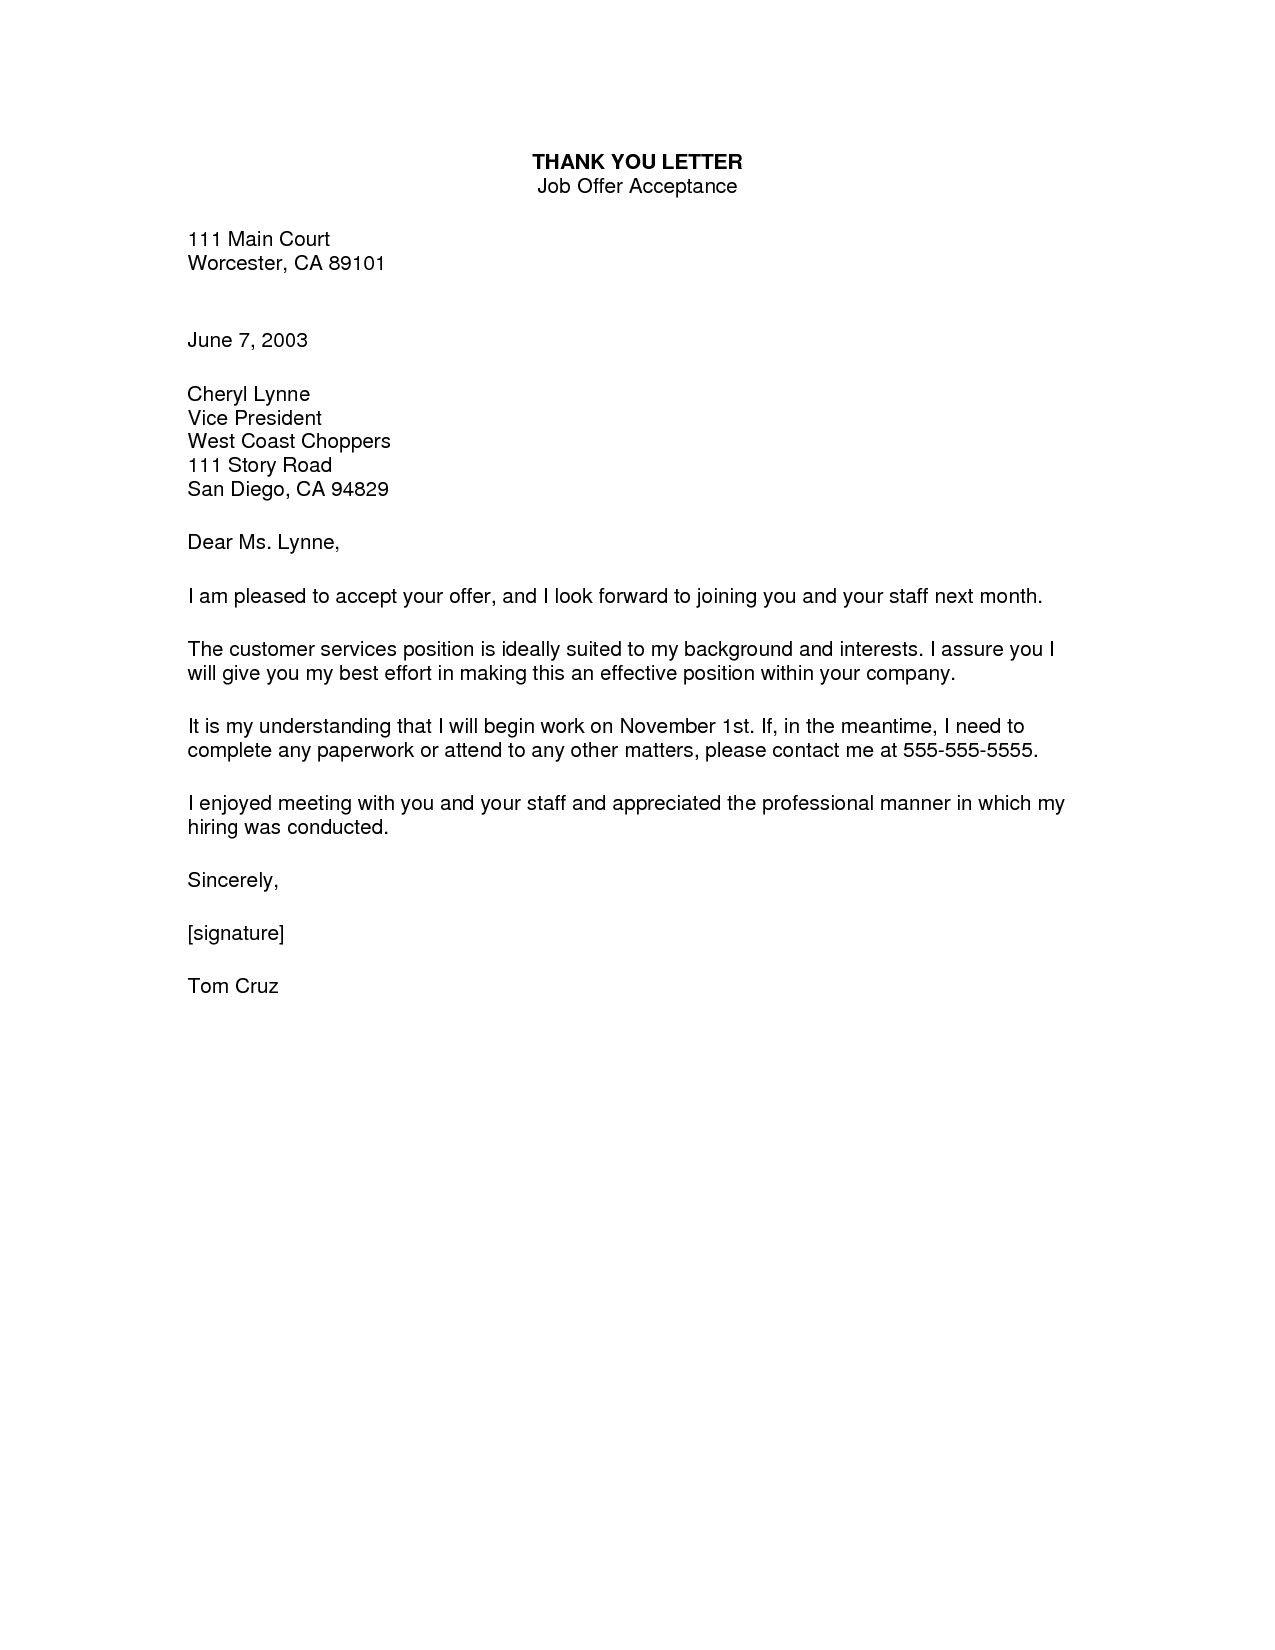 Internship Acceptance Thank You Letter Elegant 10 How to